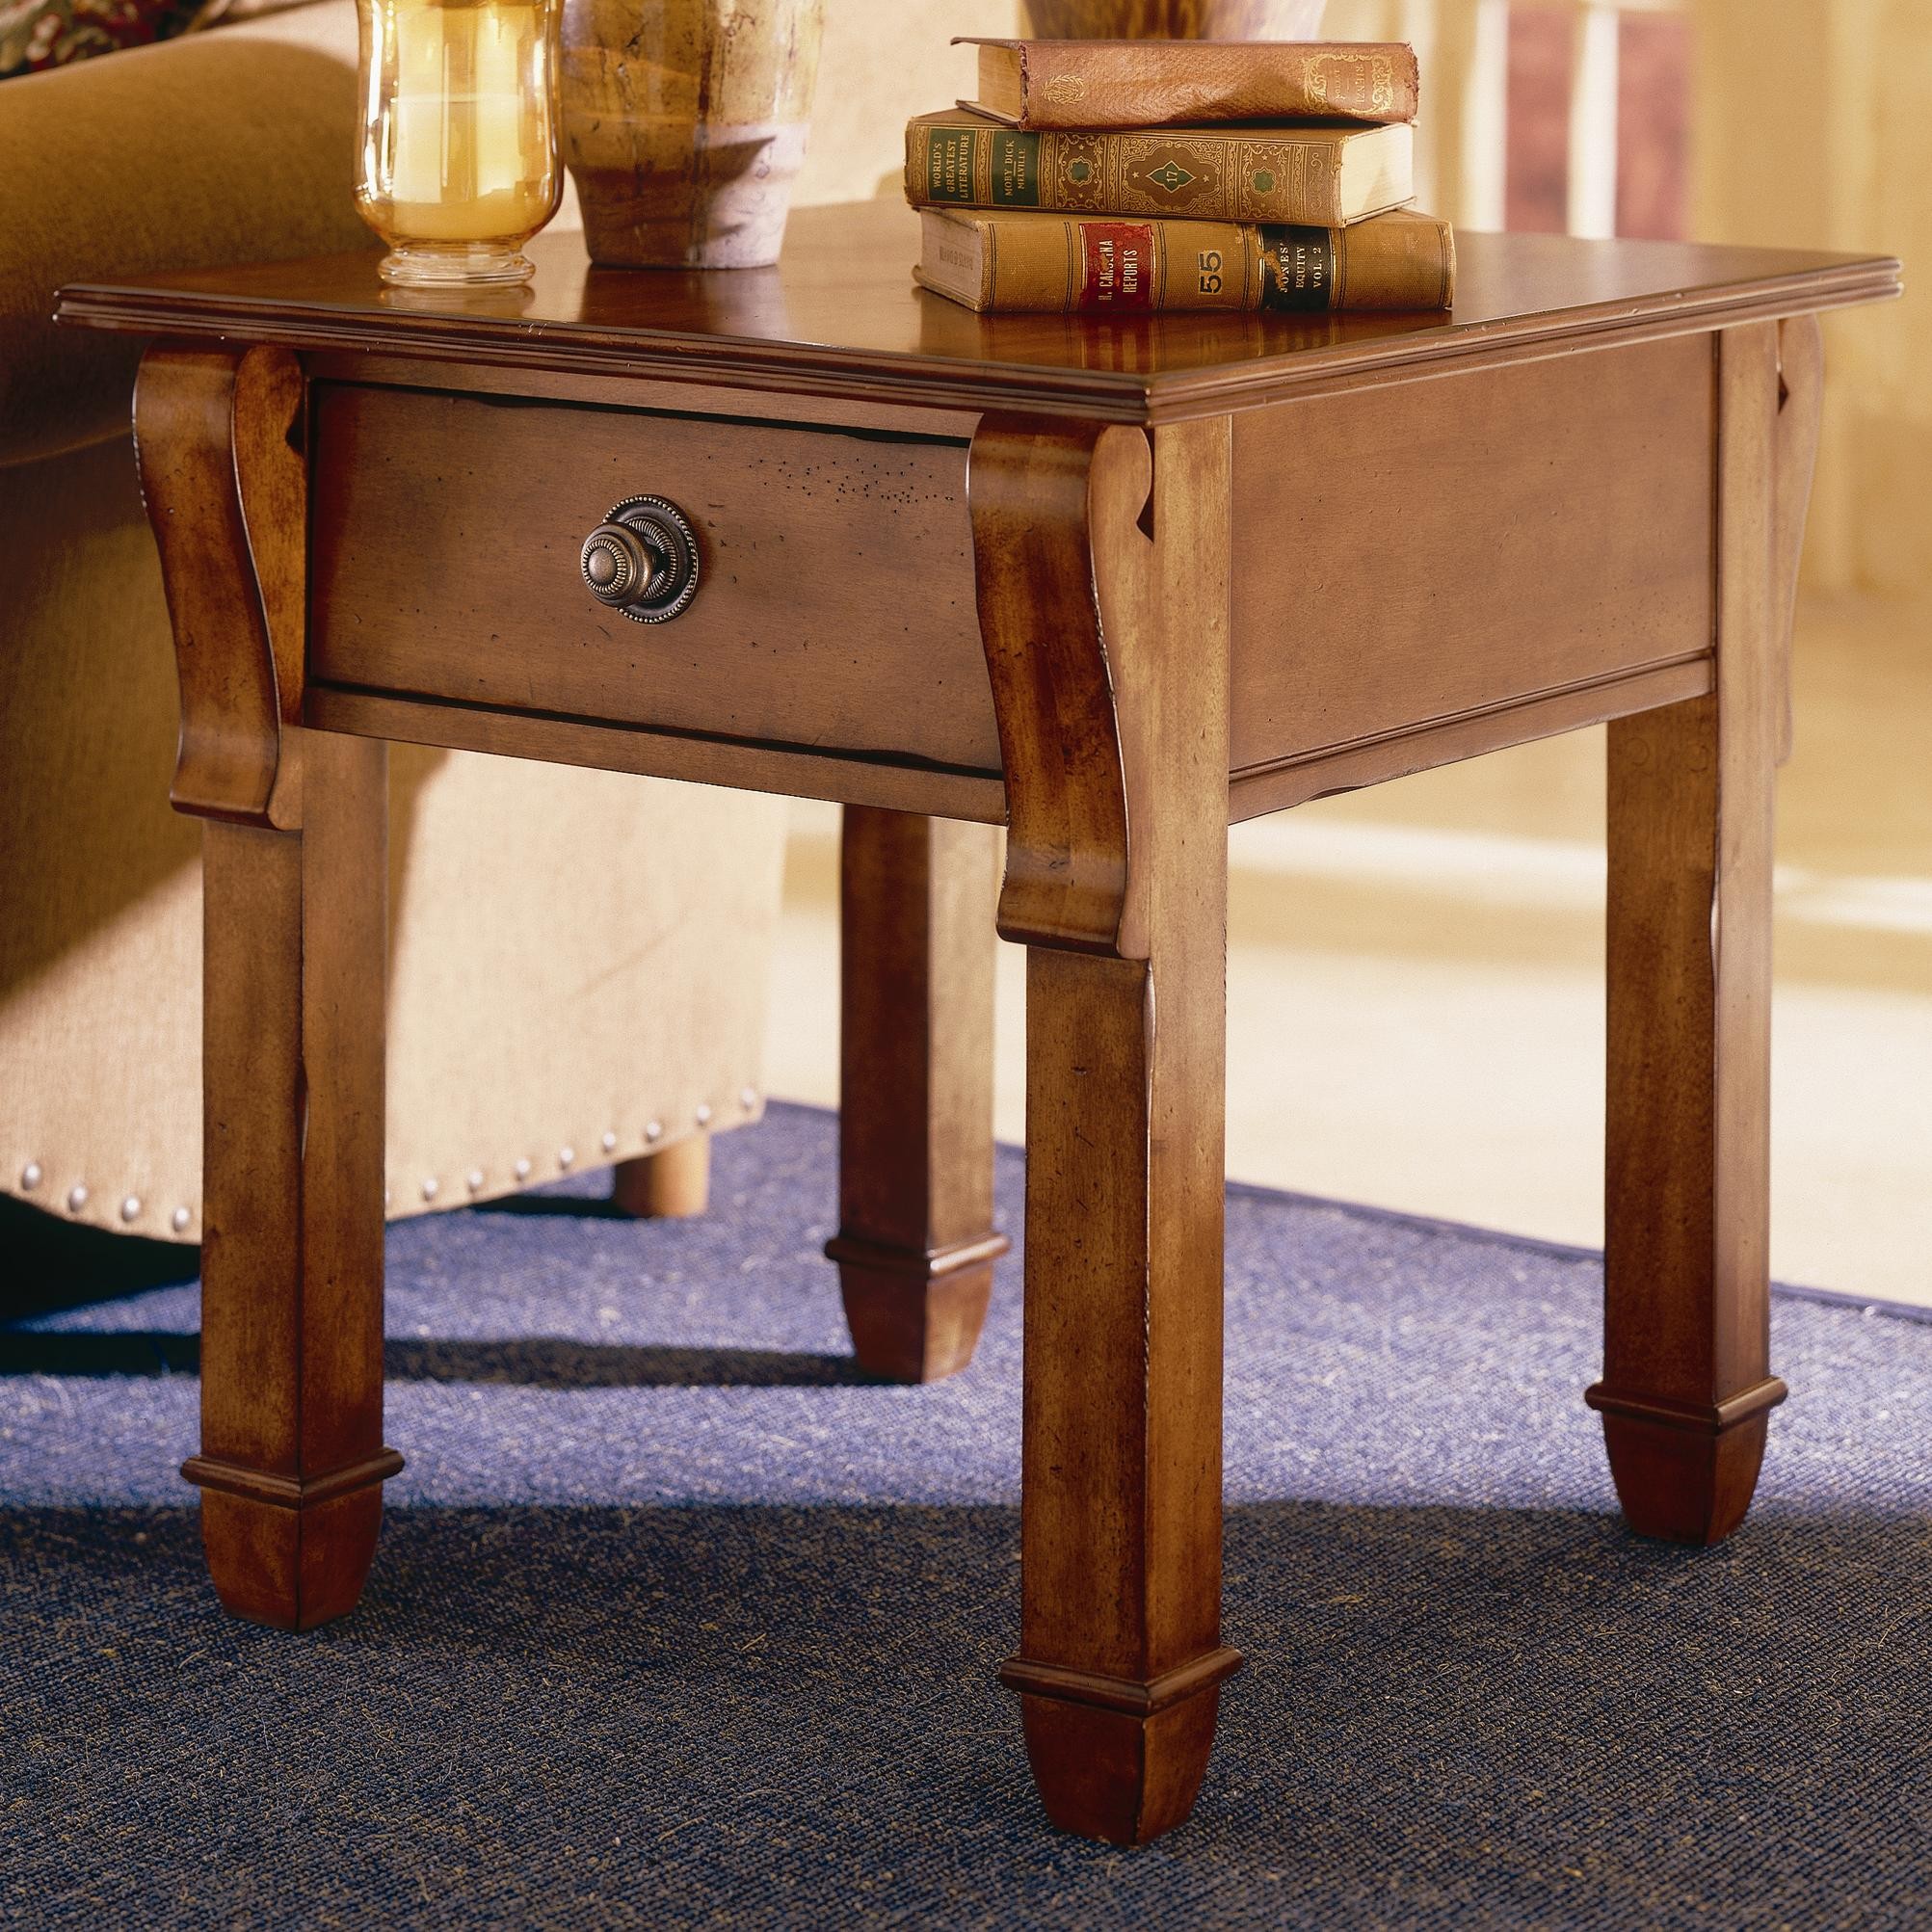 Kincaid Furniture Tuscano Drawer End Table - Item Number: 96022